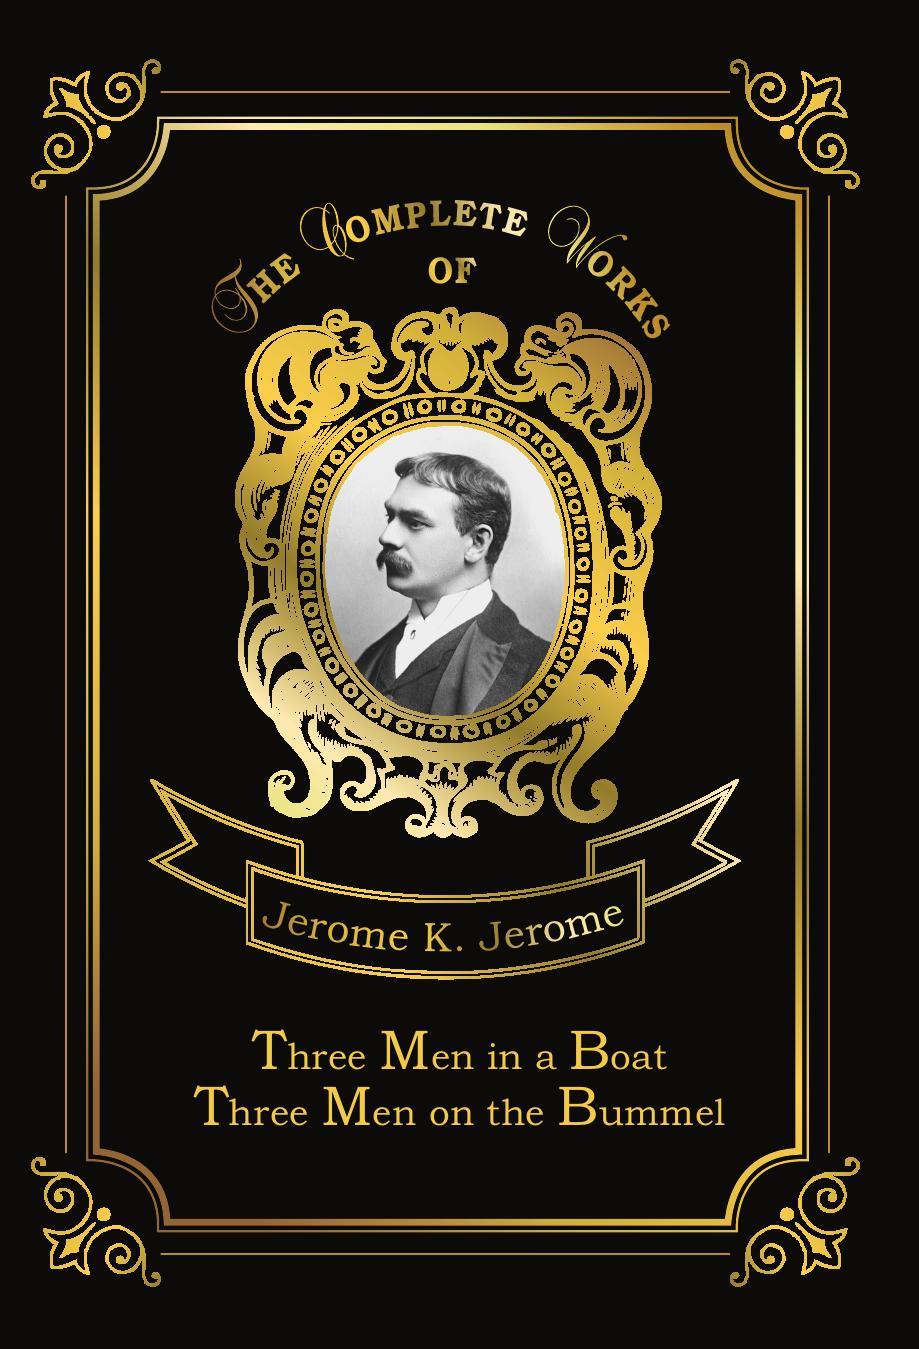 Jerome J.K. Three Men in a Boat & Three Men on the Bummel jerome k jerome three men on the bummel